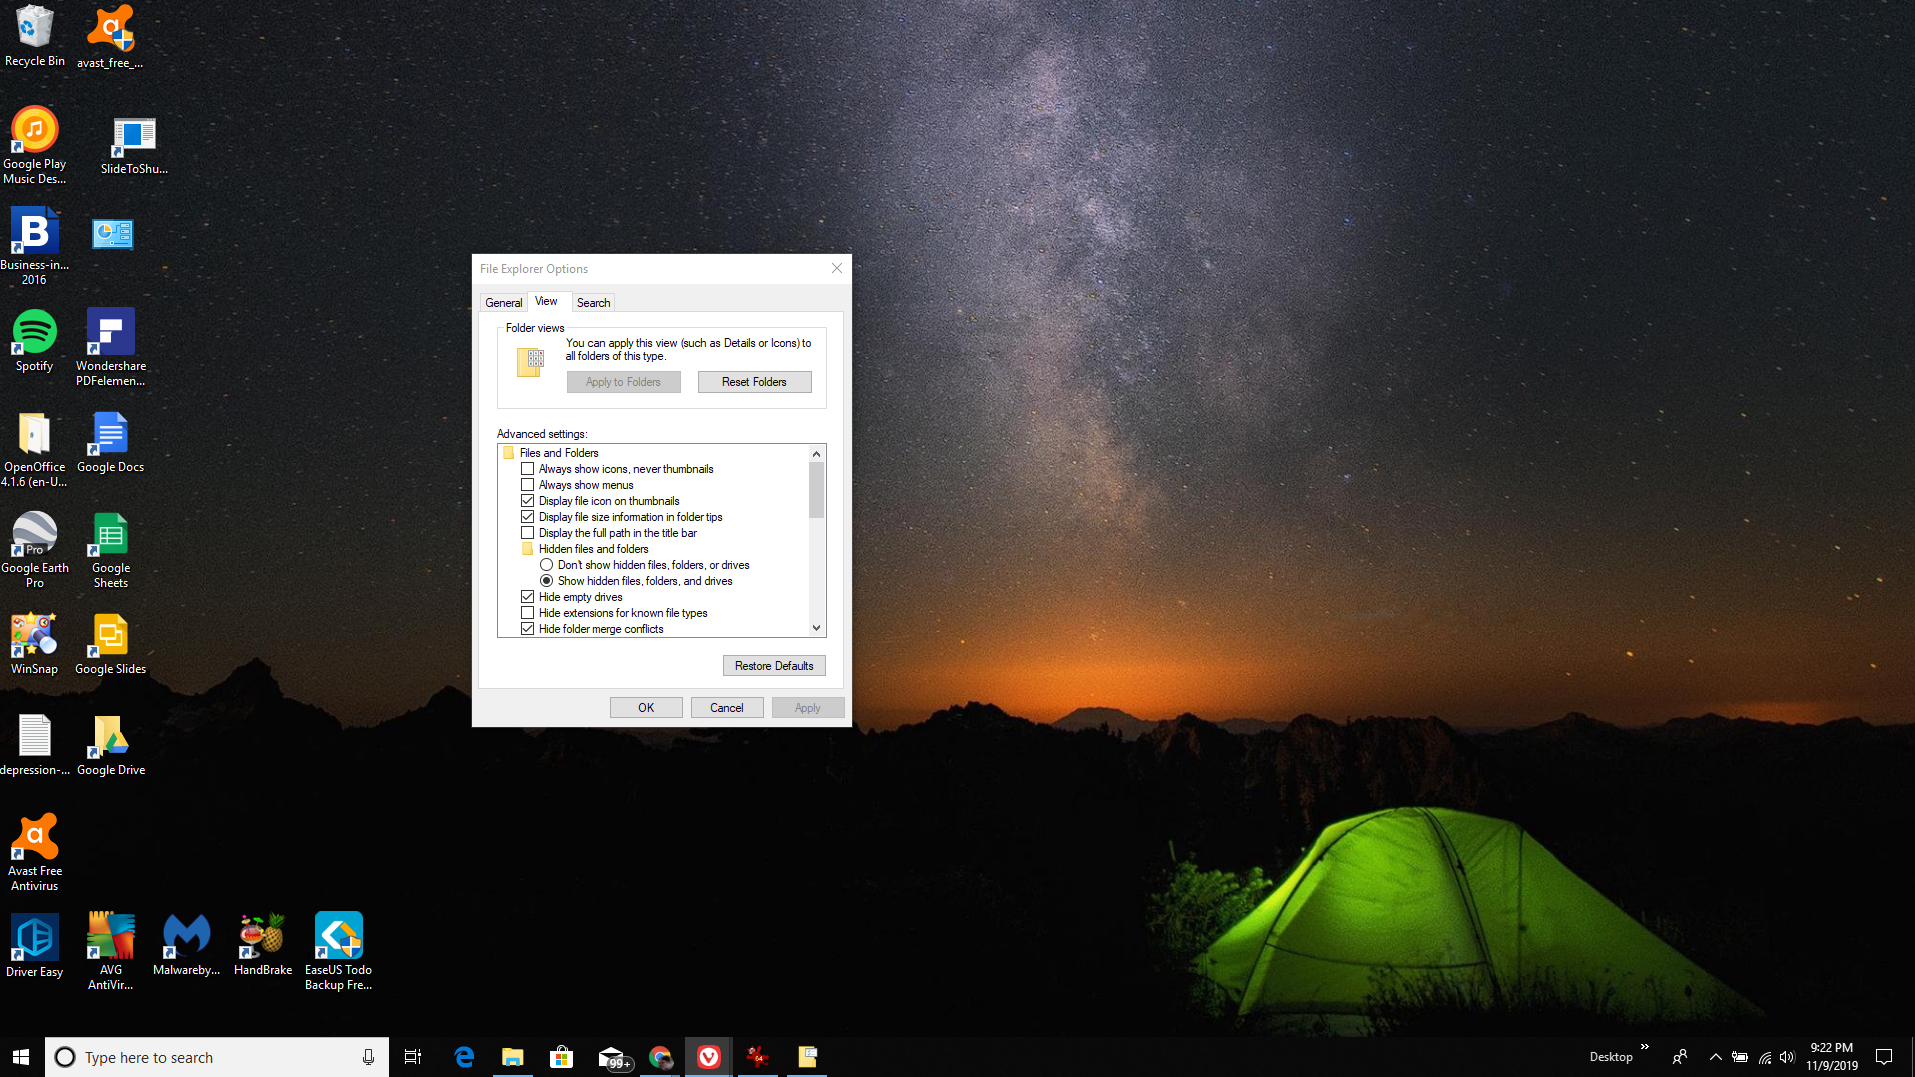 Screenshot of File Explorer Options in Windows 10